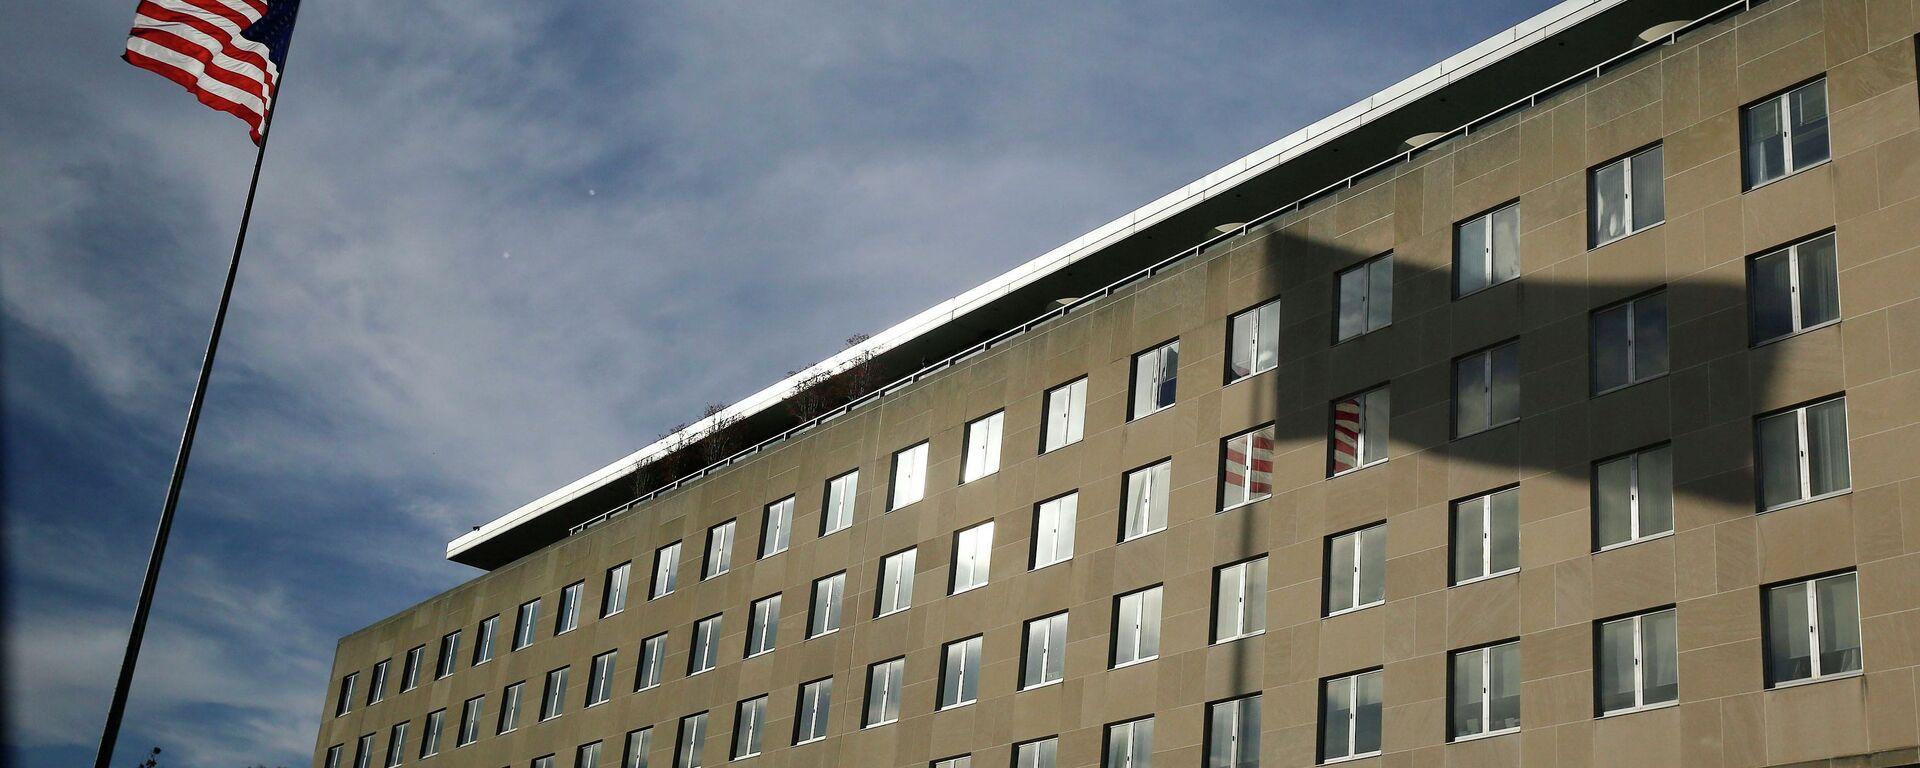 Zgrada Stejt departmenta u Vašingtonu - Sputnik Srbija, 1920, 06.08.2021